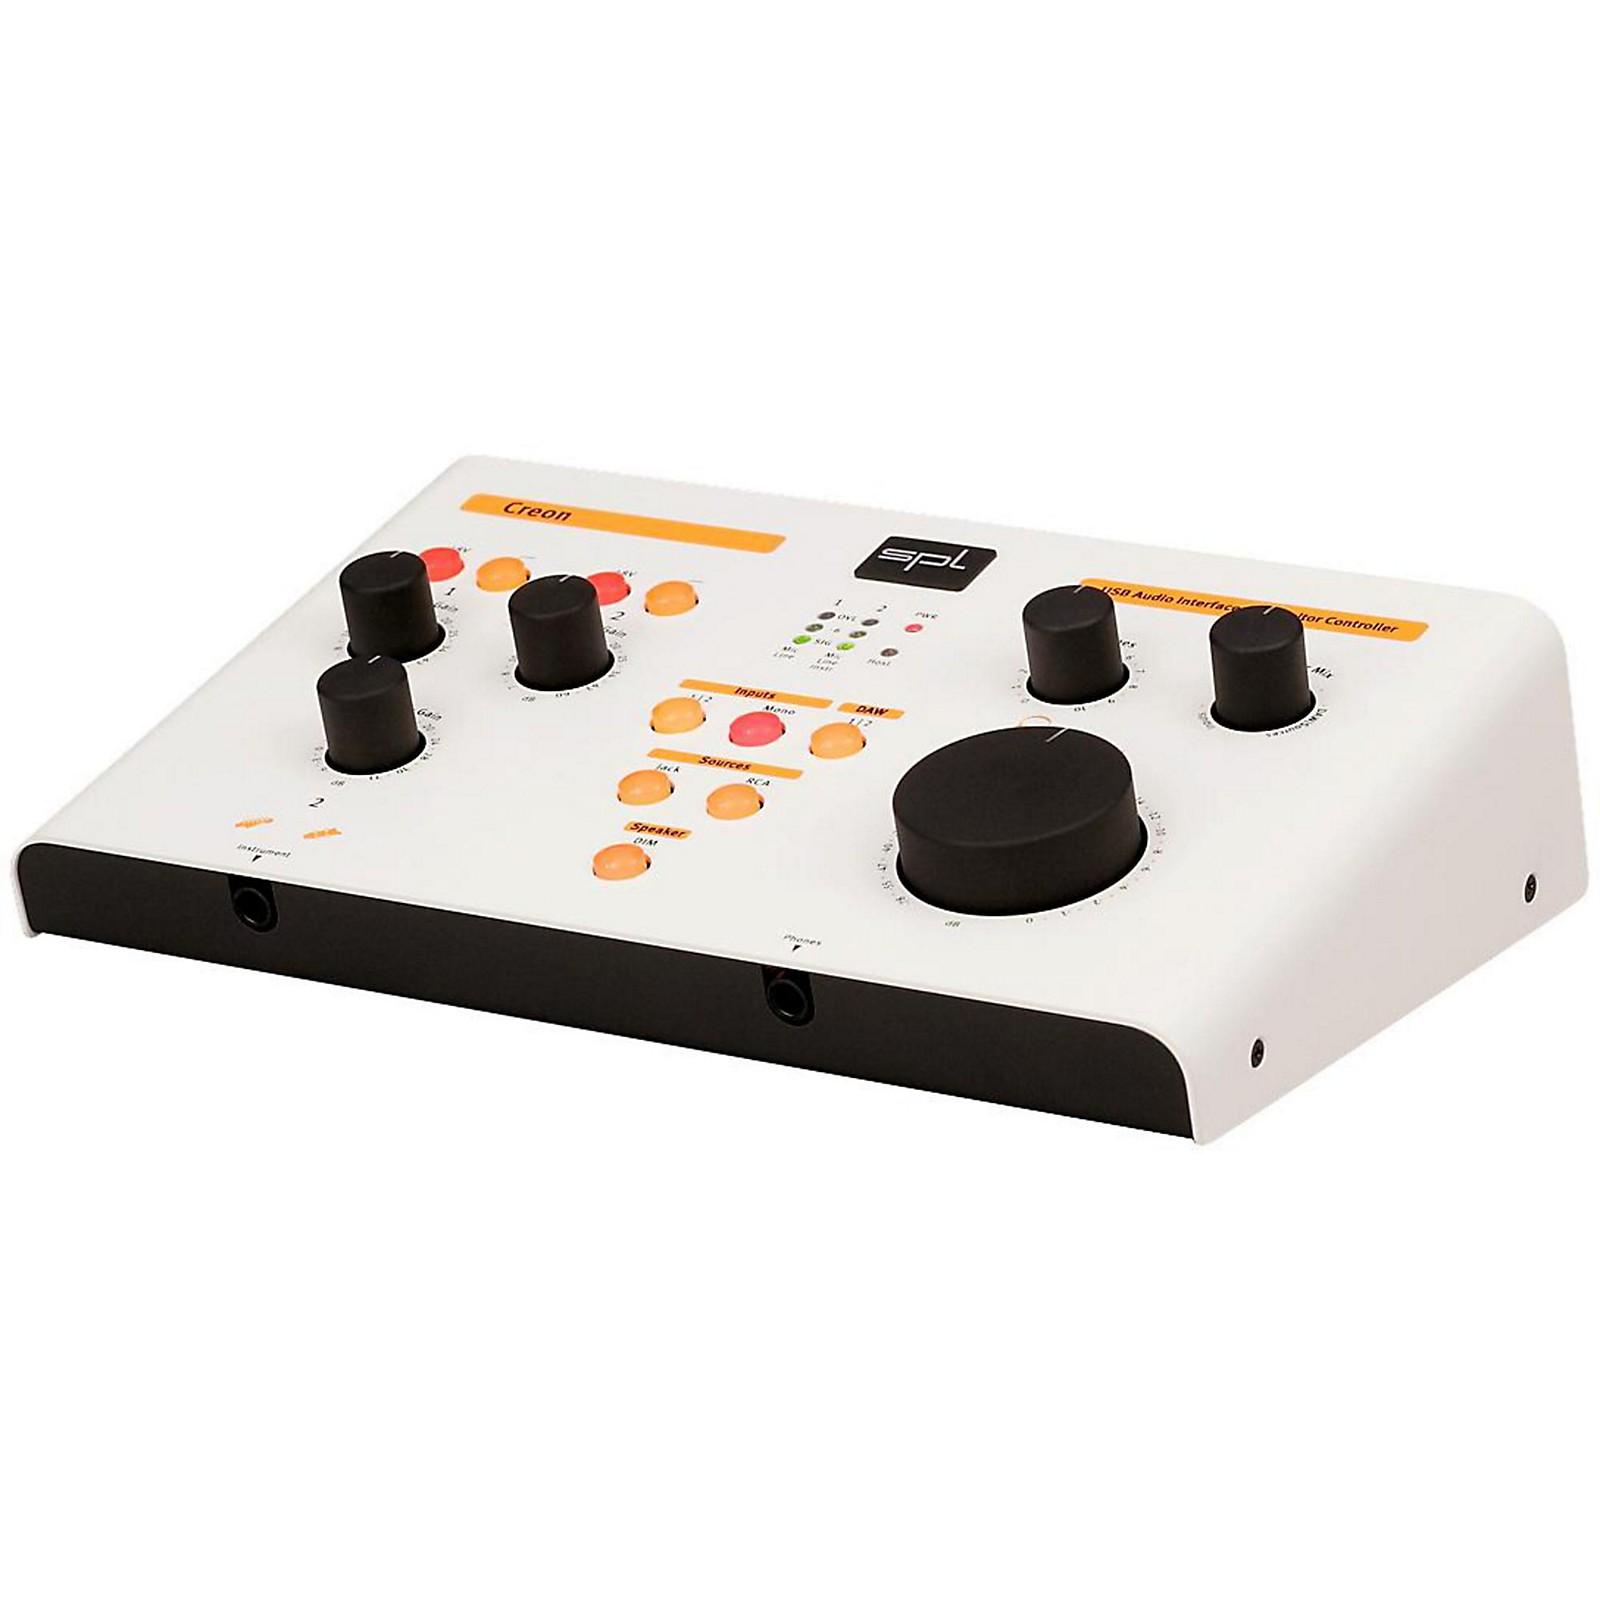 SPL Creon USB Audio Interface